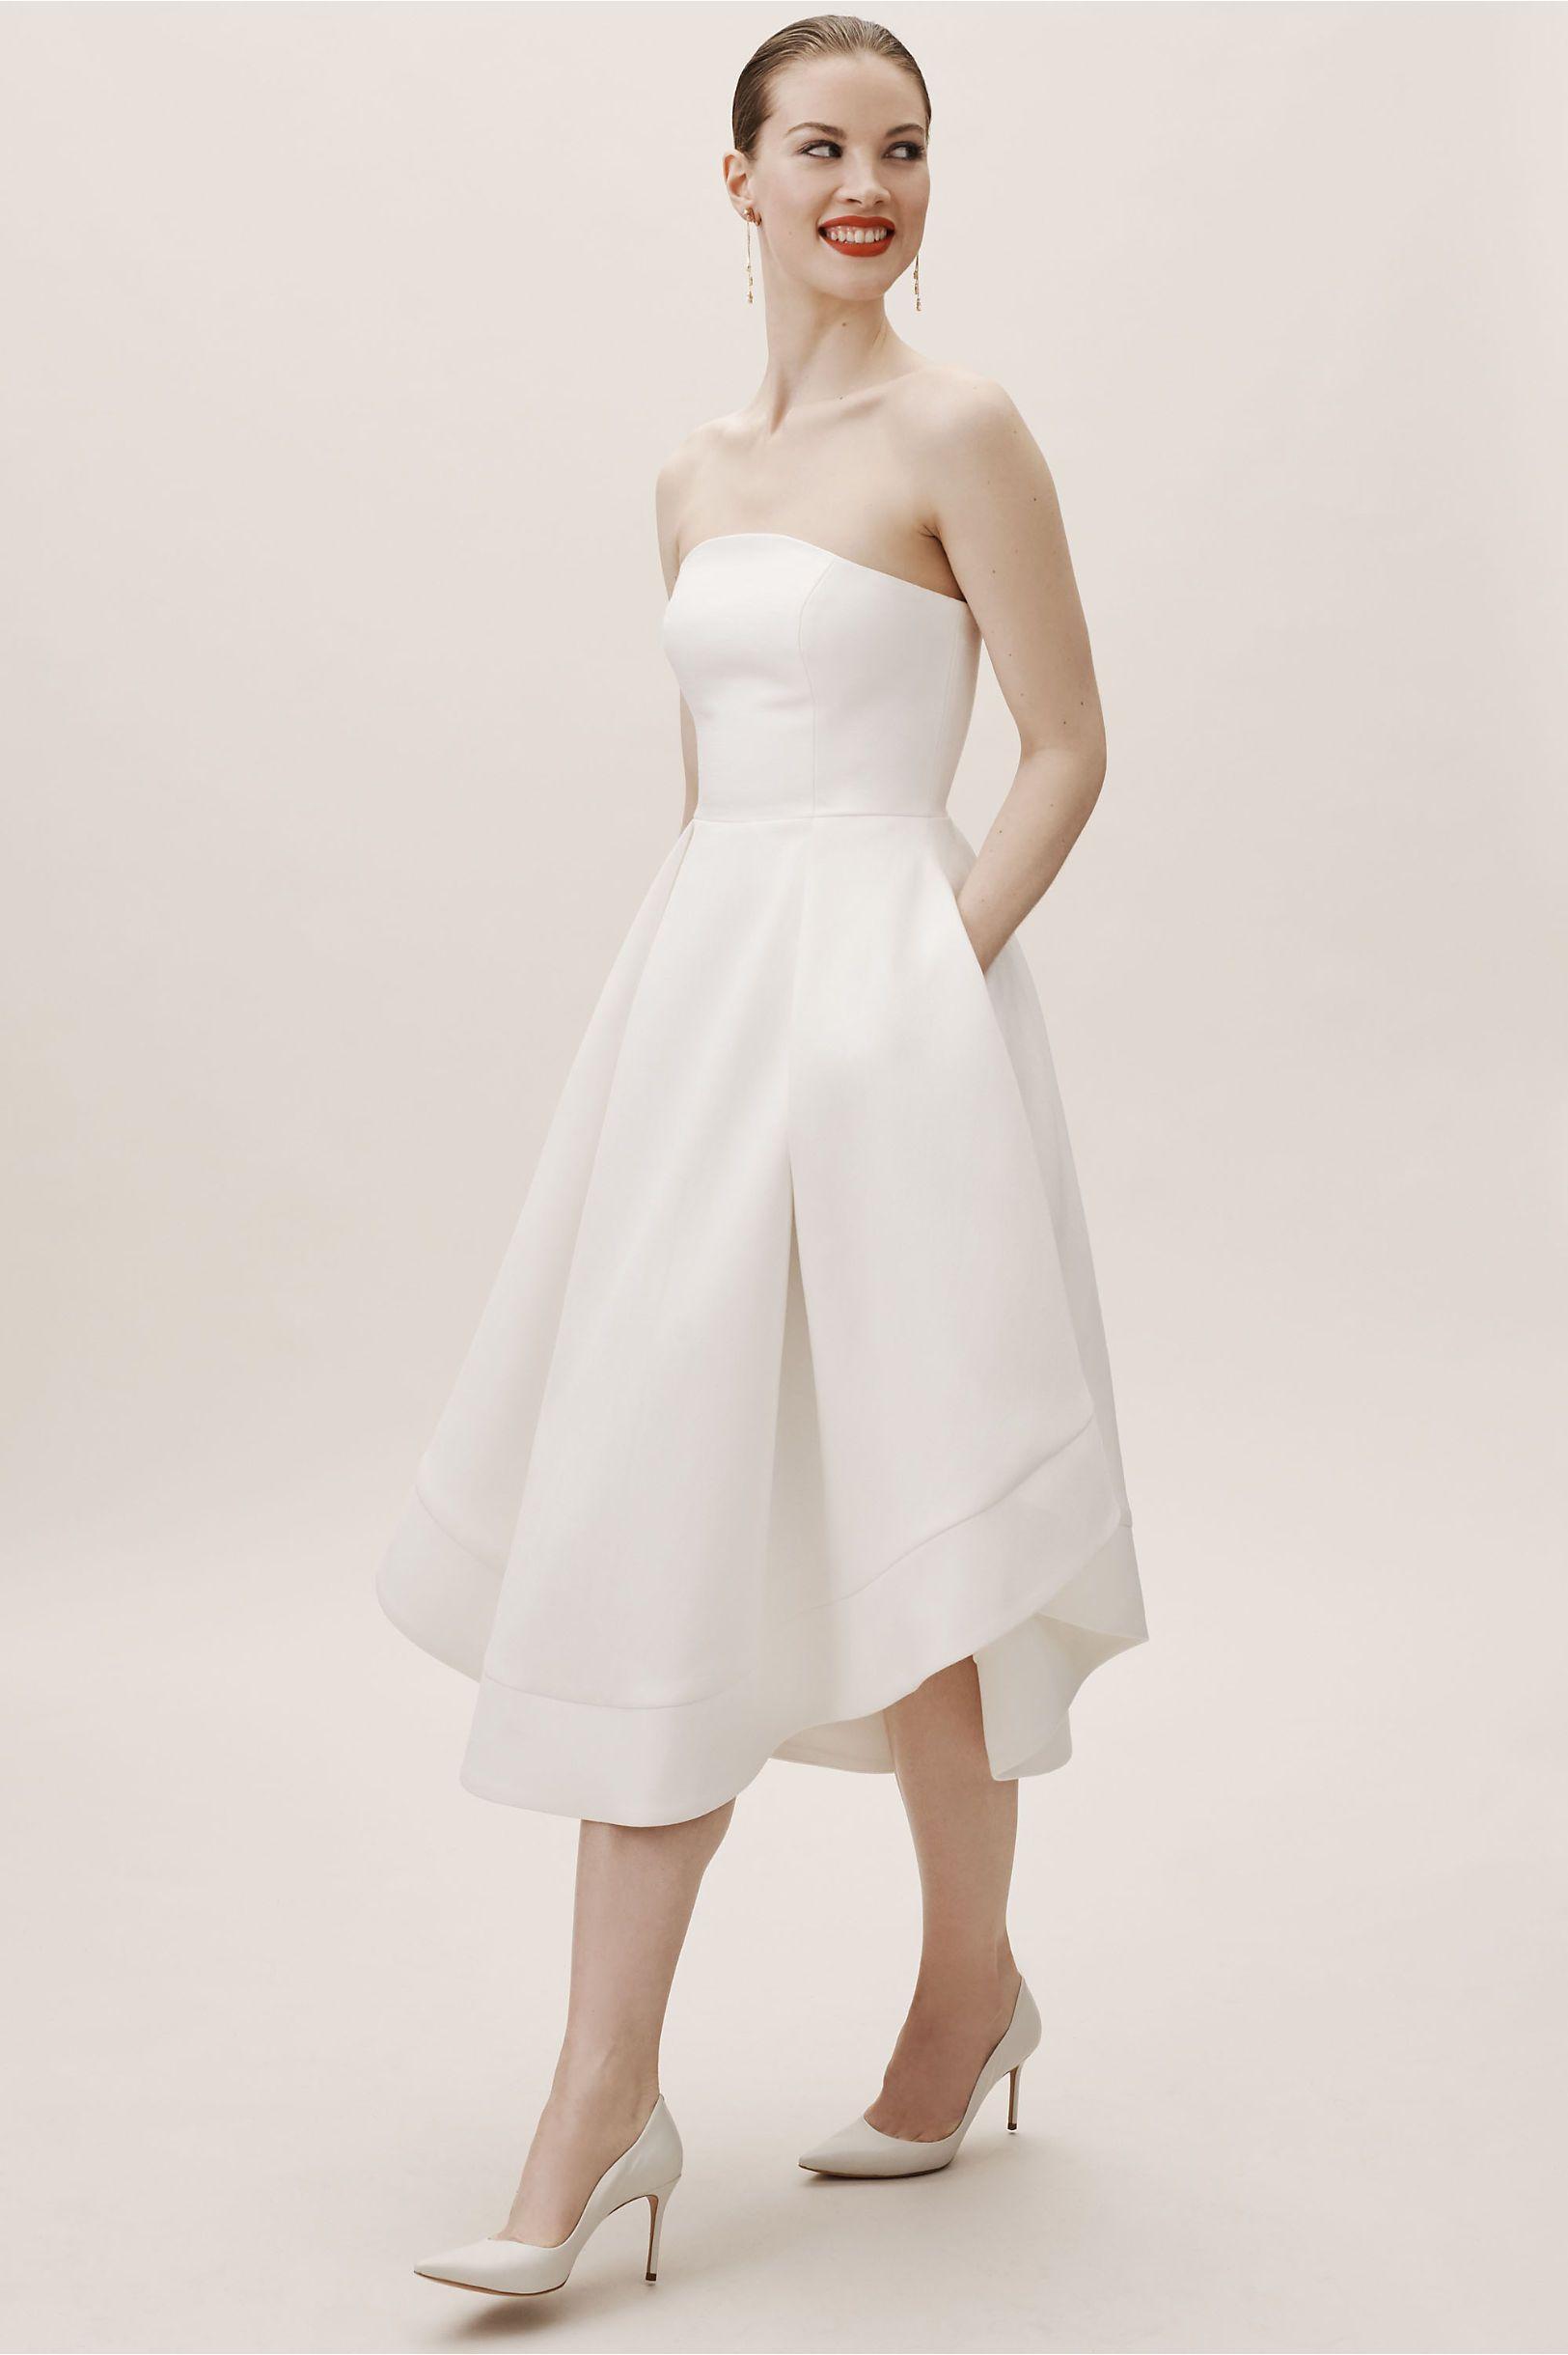 20 Simple Wedding Dresses For Every Budget A Practical Wedding A Line Wedding Dress Tea Length Wedding Dress Pleated Wedding Dresses [ 2440 x 1625 Pixel ]